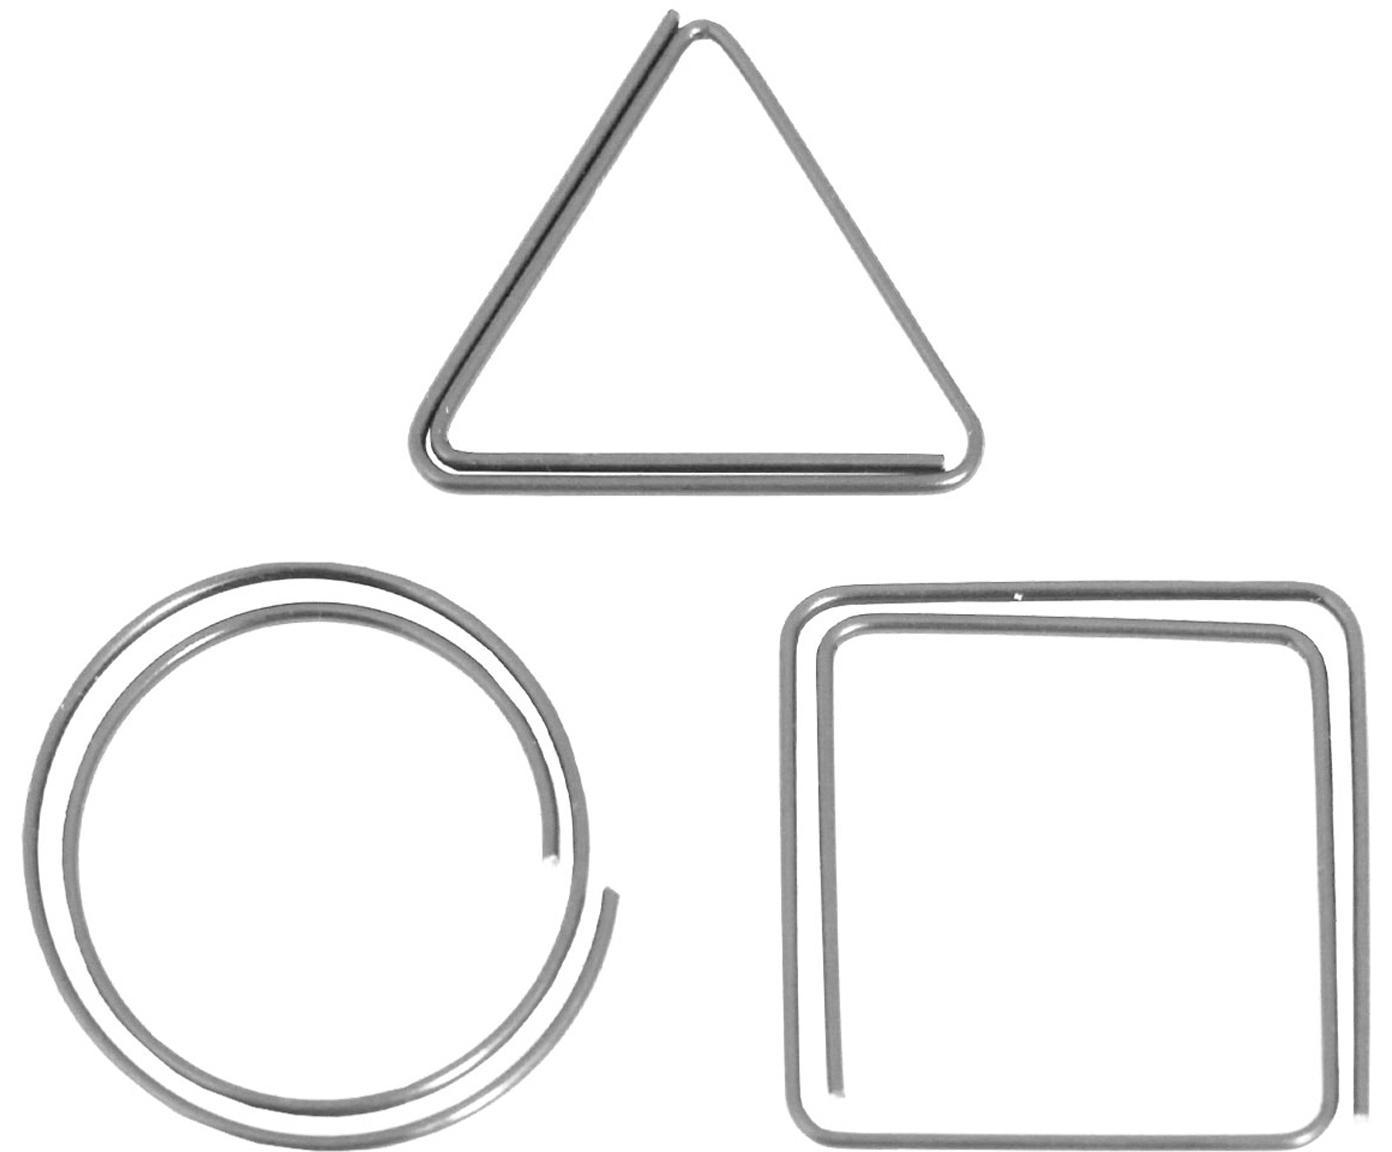 Set di graffette Geometria, 9 pz., Metallo verniciato, Metallo, Larg. 3 x Alt. 3 cm